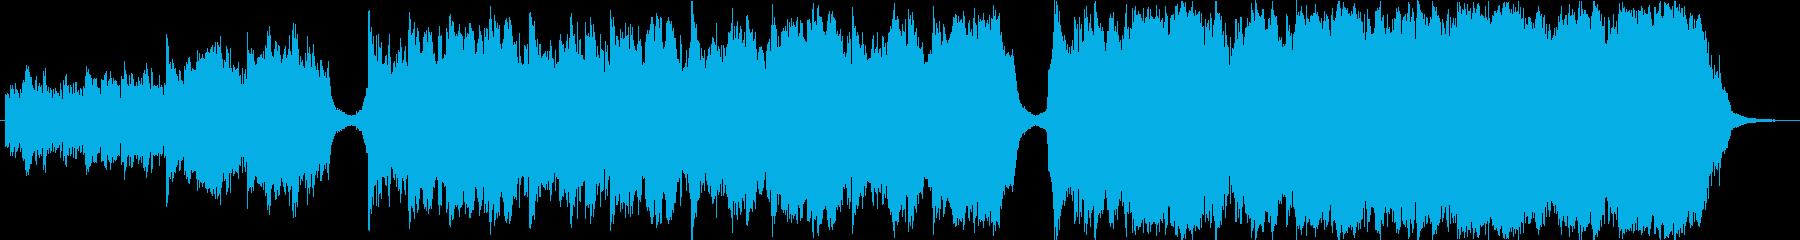 Cinematic Musicの再生済みの波形